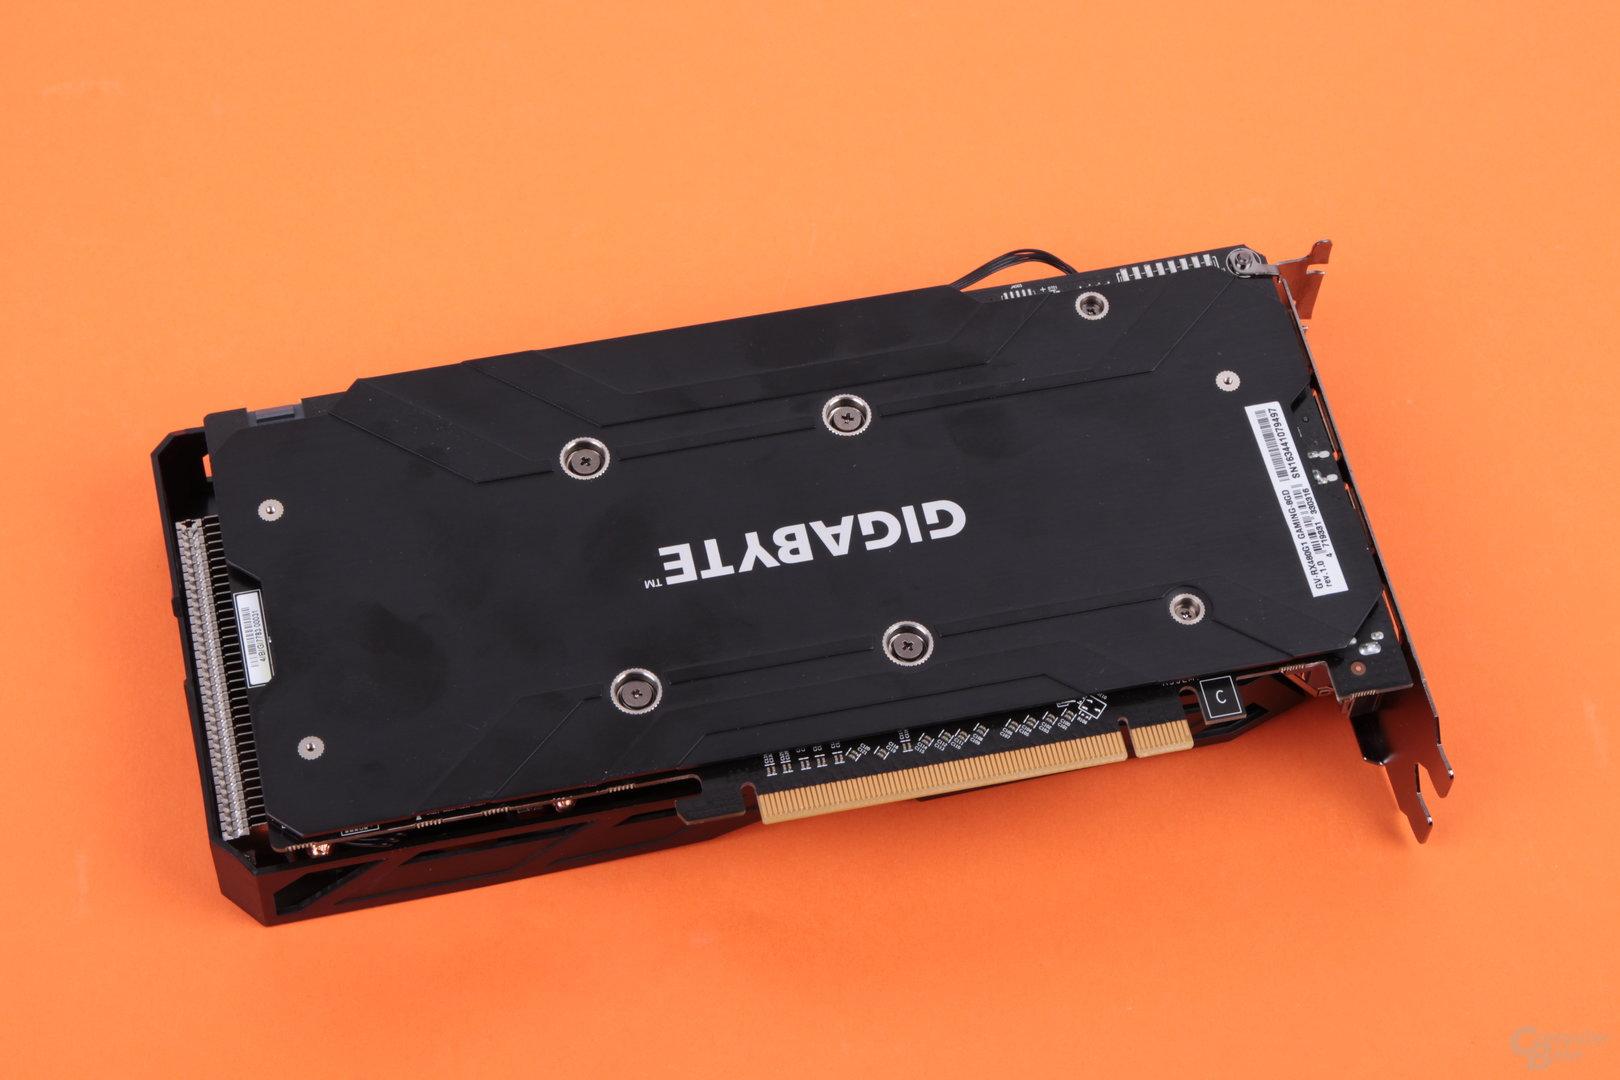 Gigabyte Radeon RX 480 G1 Gaming – Rückseite